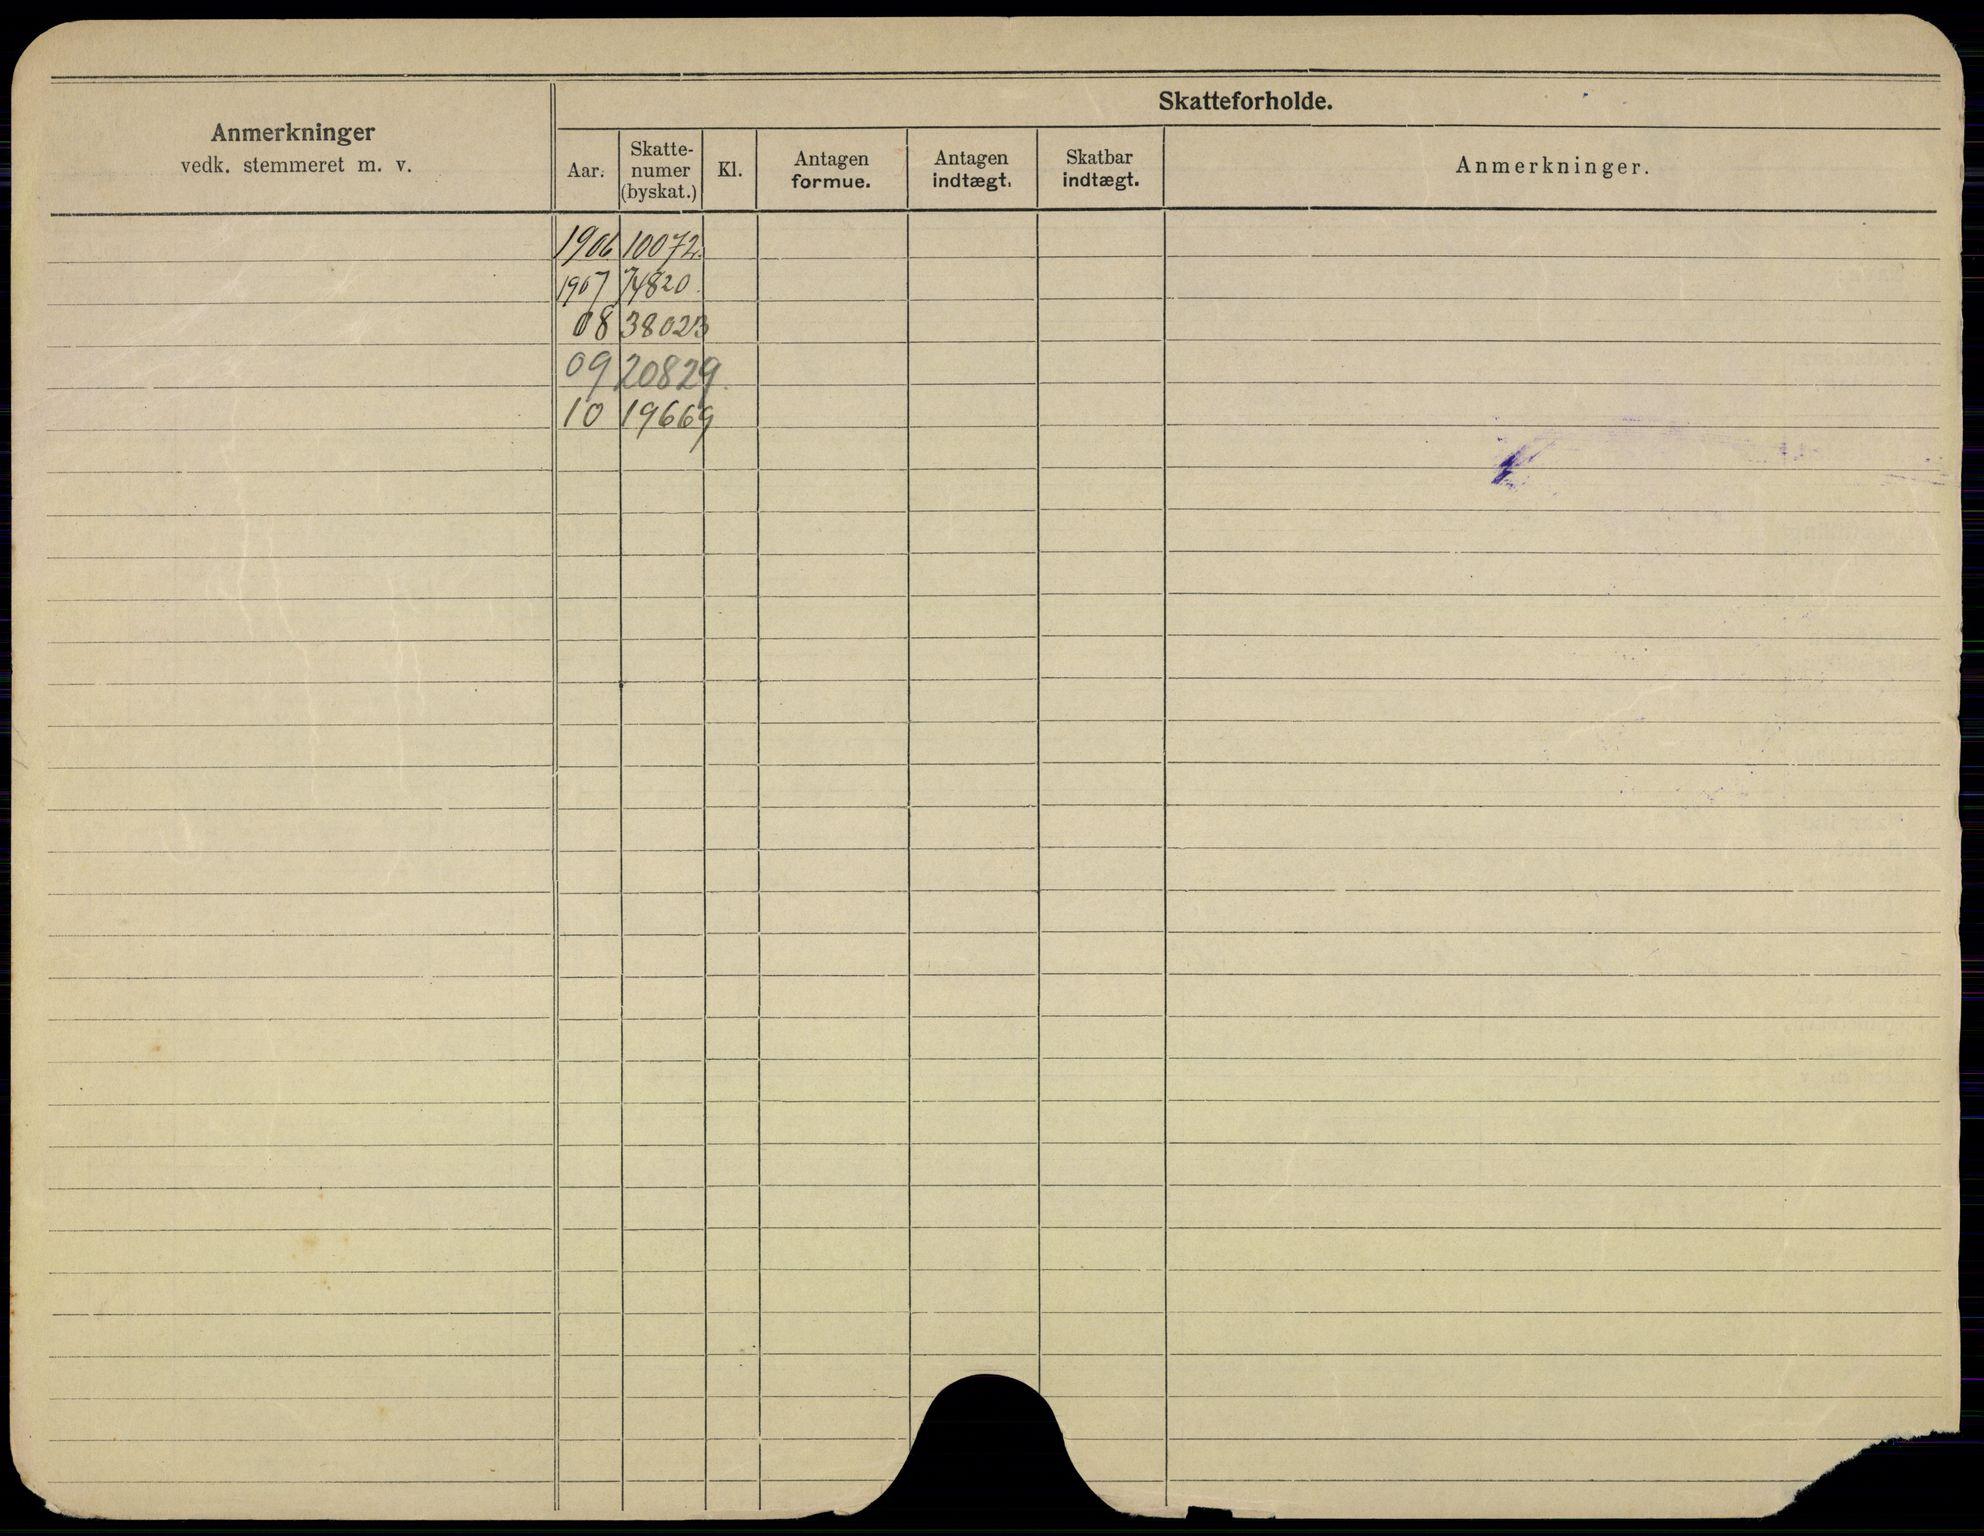 SAO, Oslo folkeregister, Registerkort, G/Gb/L0011: Menn, 1911